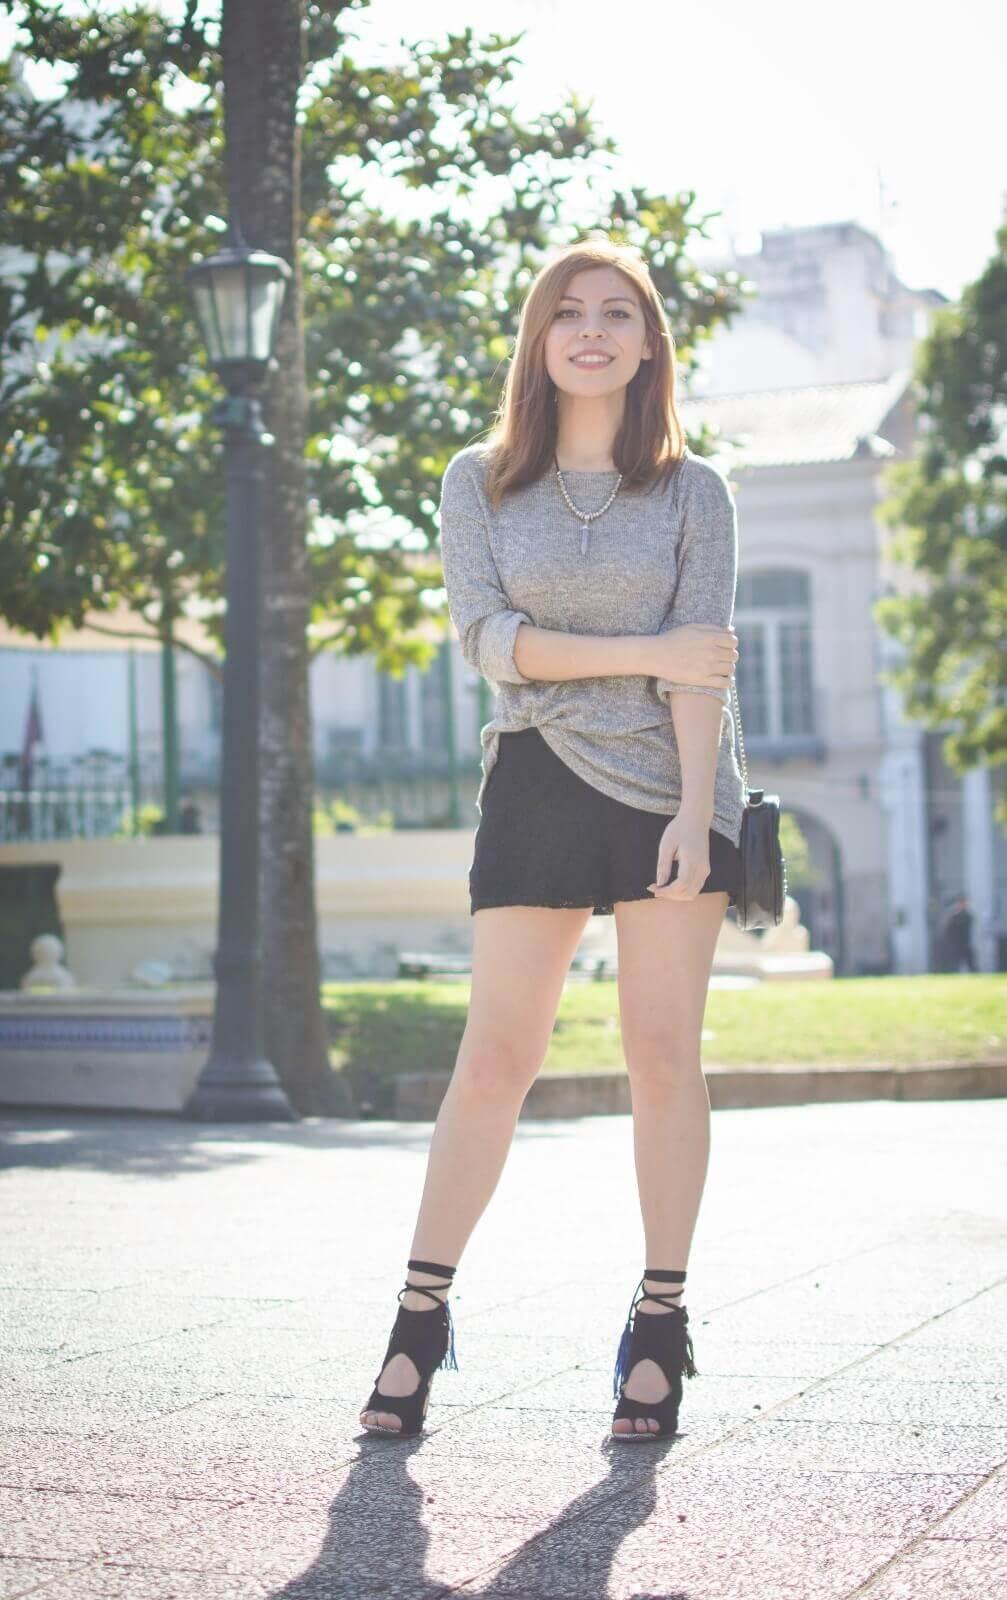 zaful-statement-shoes-silver-mirrored-sunglasses-deborah-ferrero-streetstyle-style-by-deb02